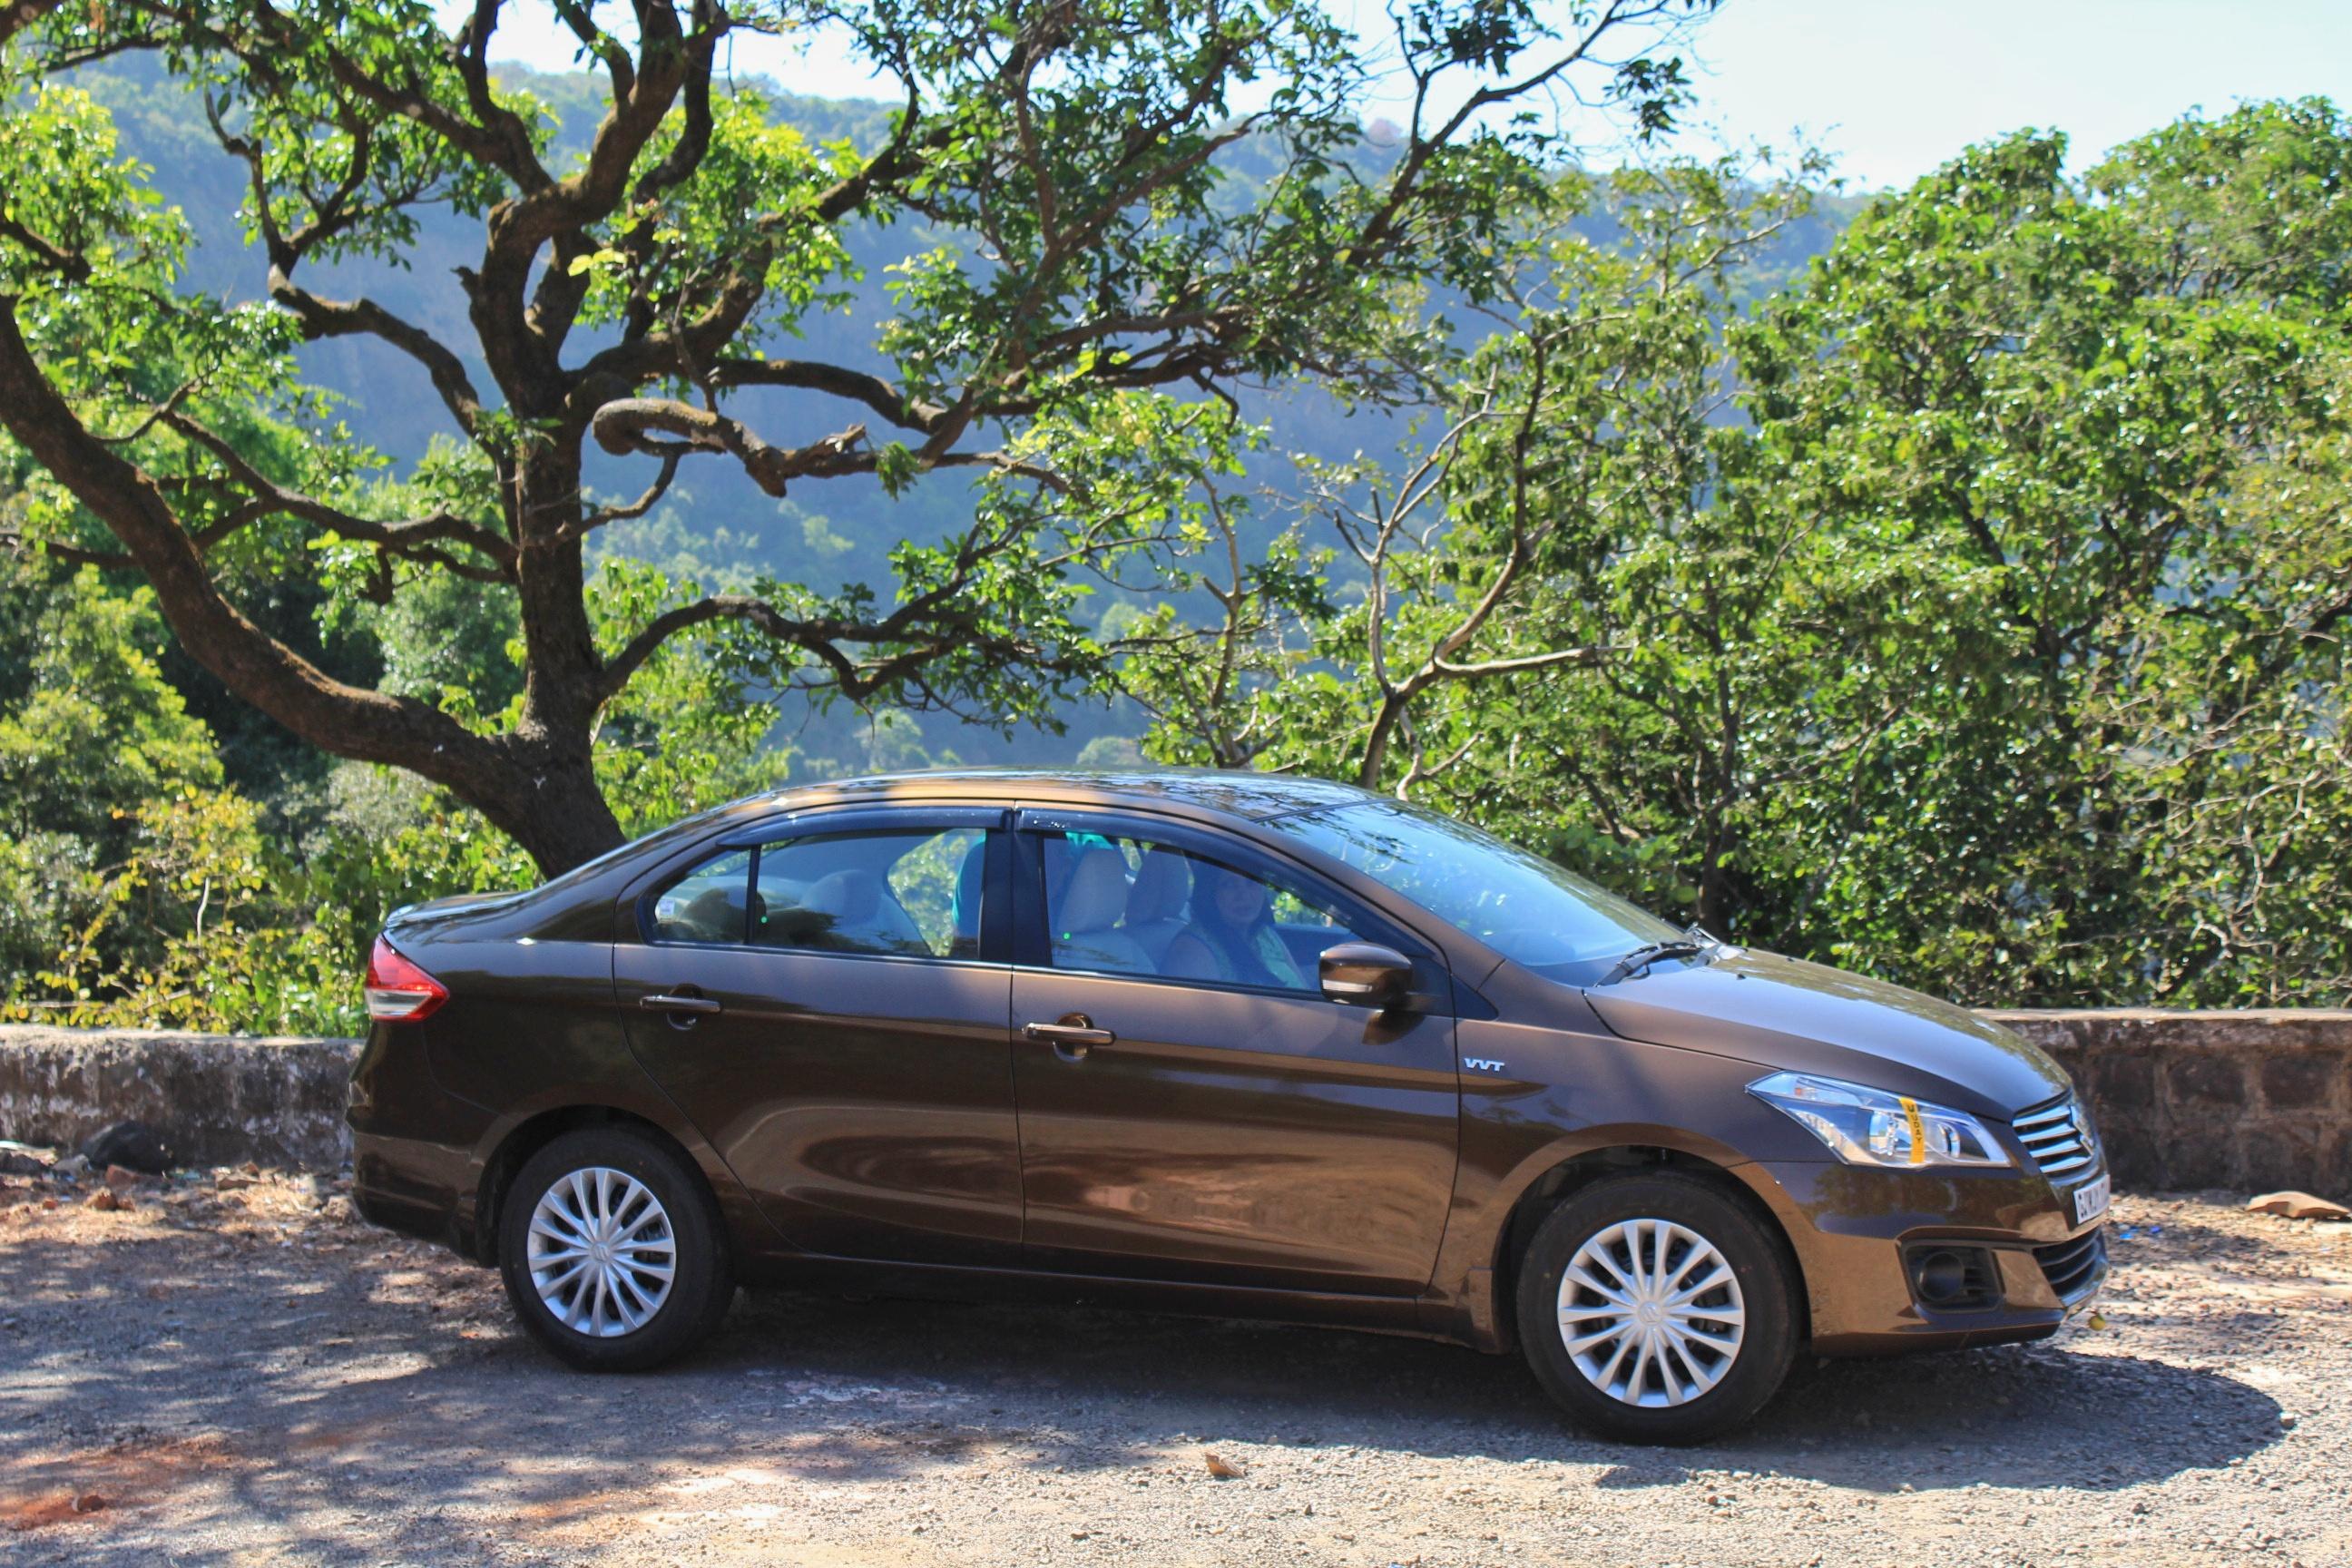 Road Trip to Amboli Ghat